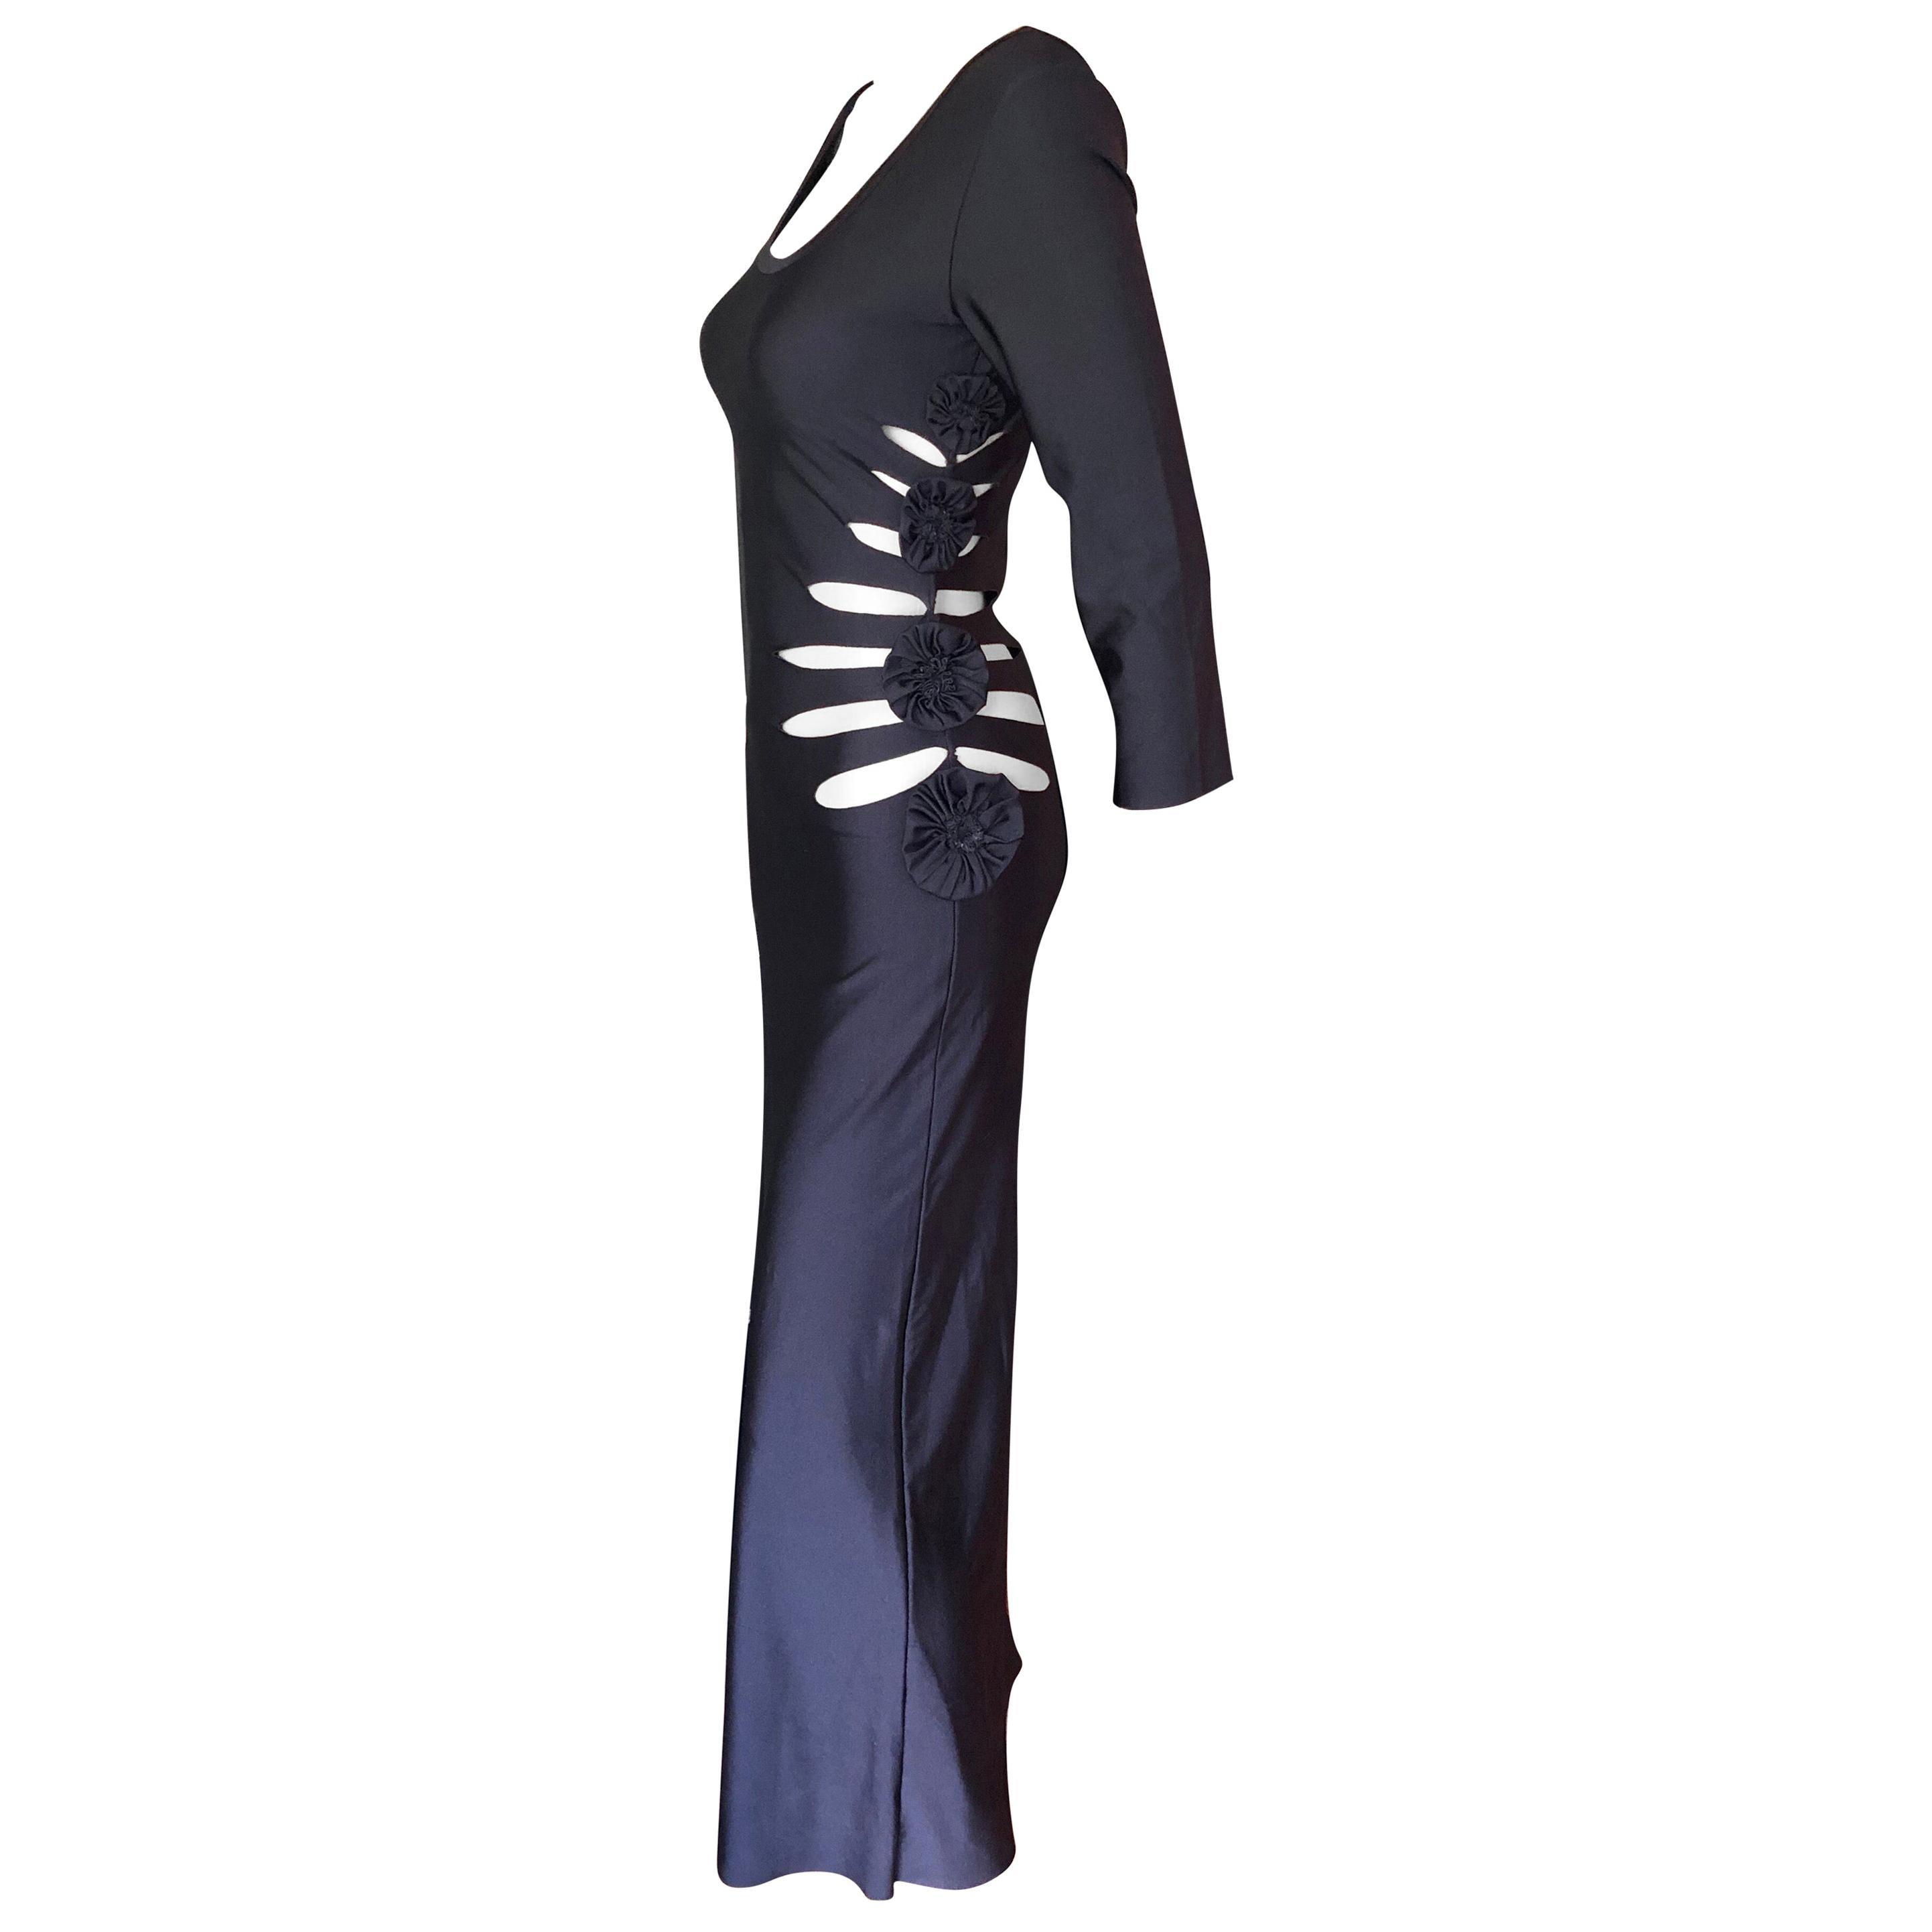 Jean Paul Gaultier Soleil Cutout Bodycon Black Maxi Dress